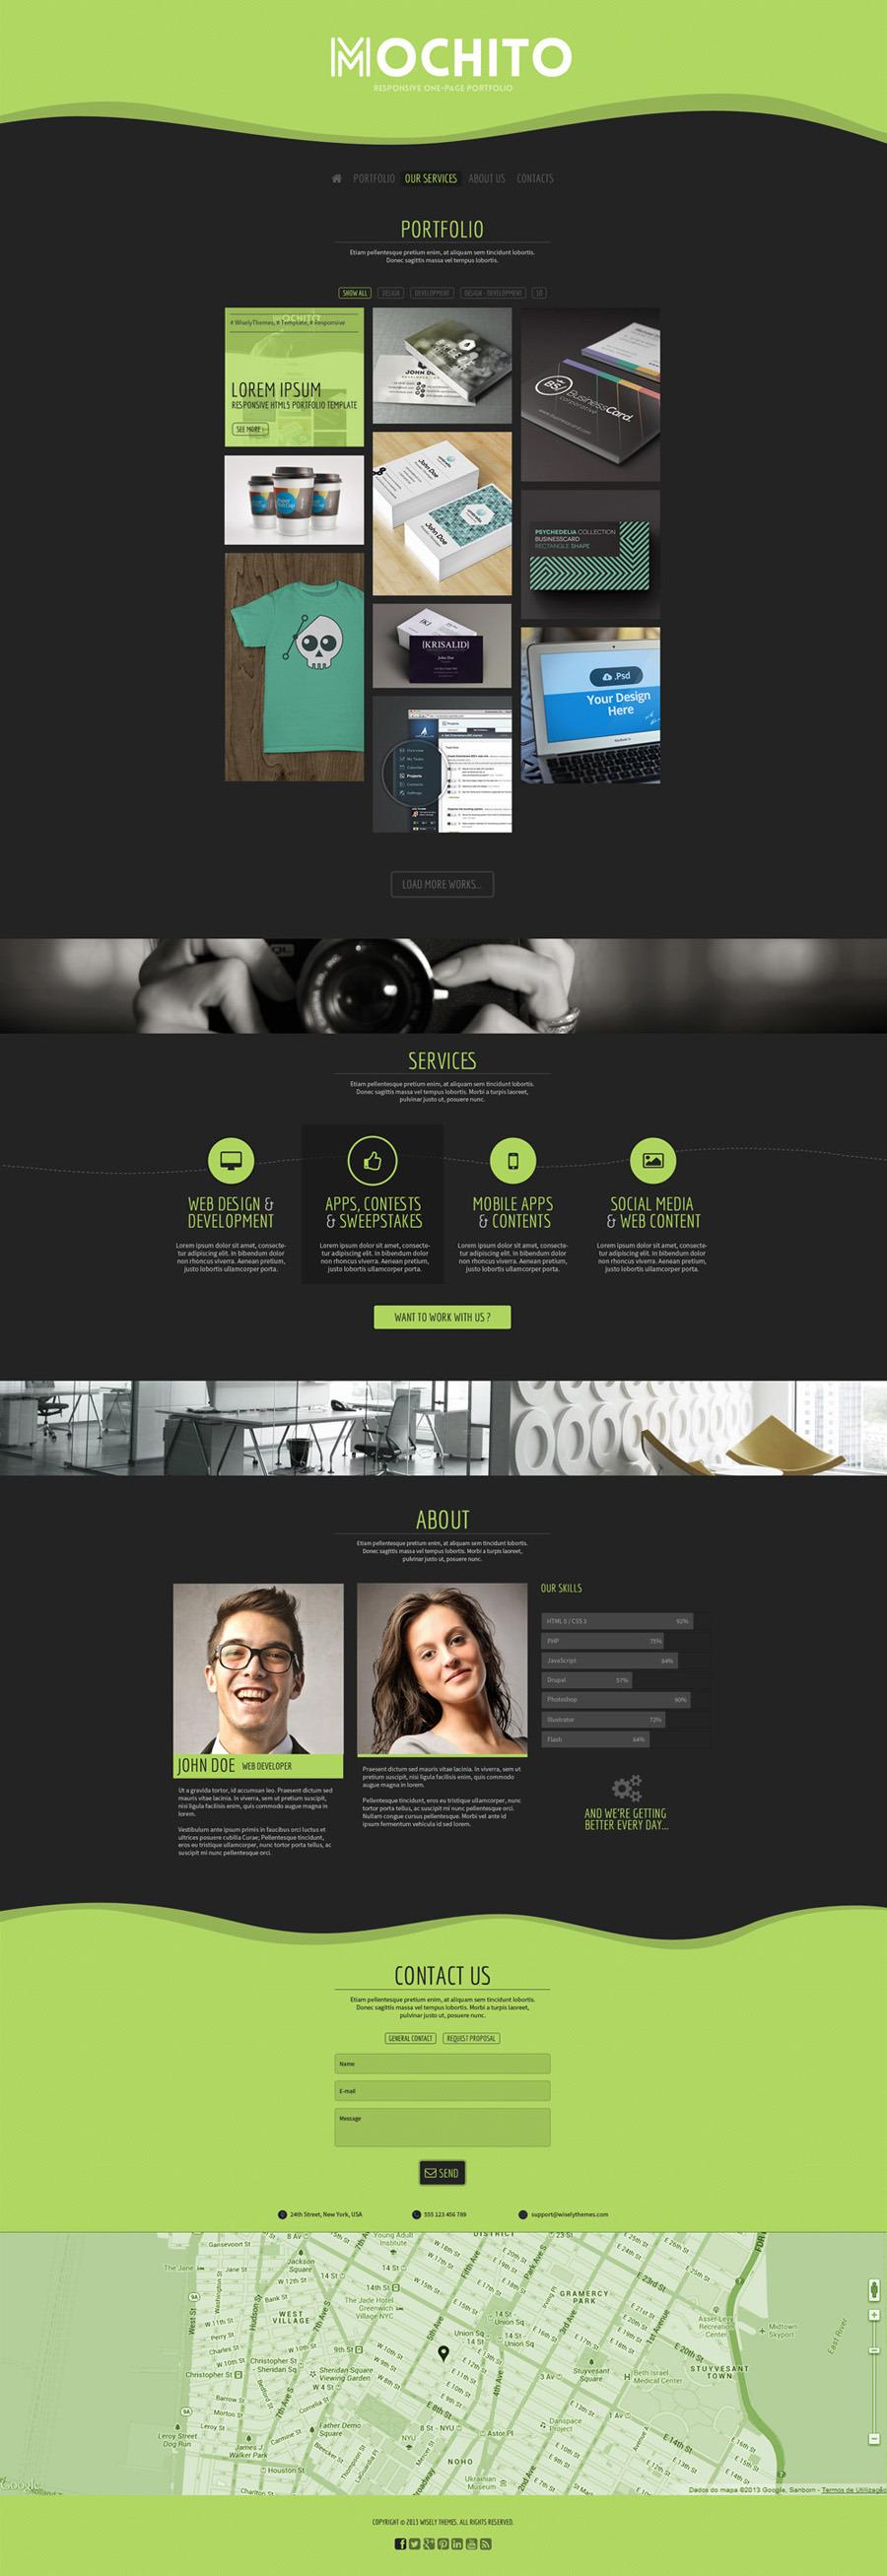 Mochito - Responsive Onepage Portfolio Template